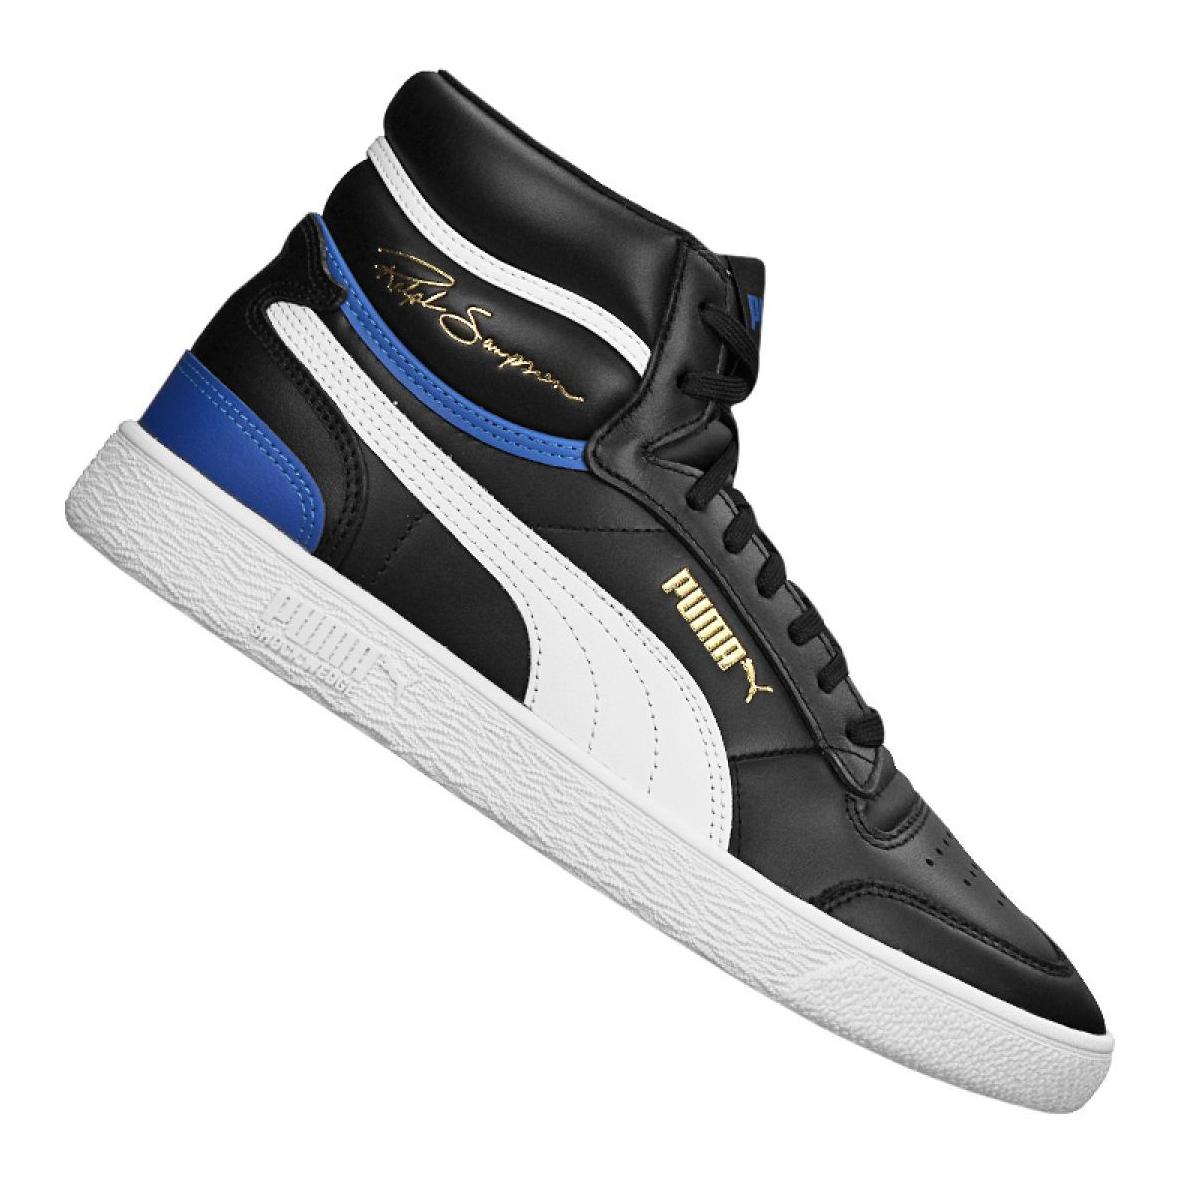 Puma Ralph Sampson Mid M 370847-17 basketball shoe black